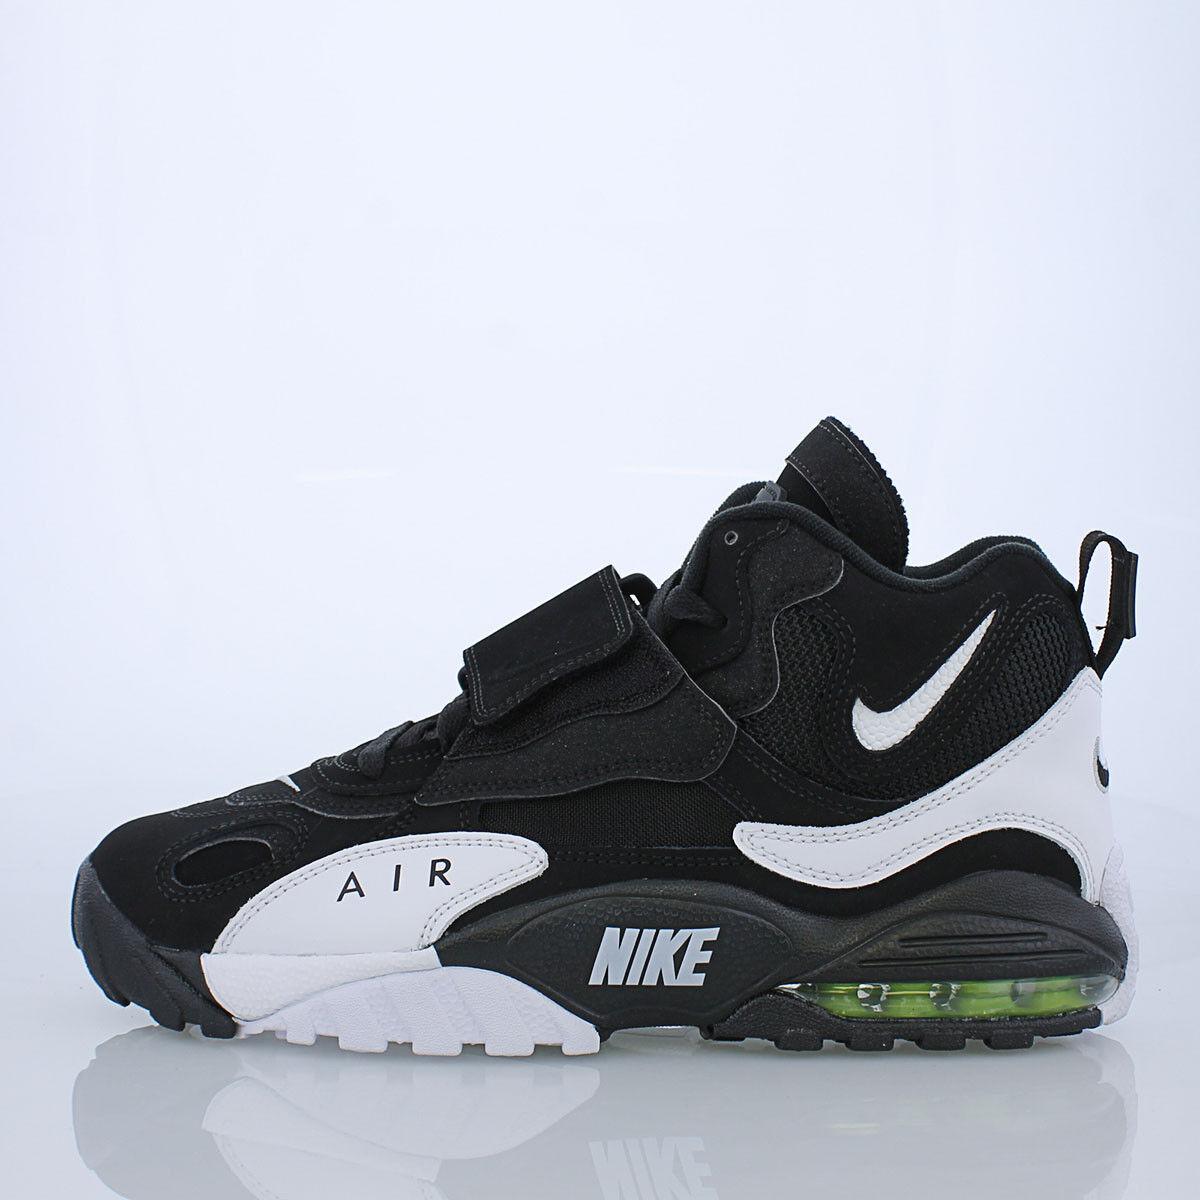 Nike Air Max Speed Turf Sz 10 nero bianca giallo Deion Sanders oreo 525225-011